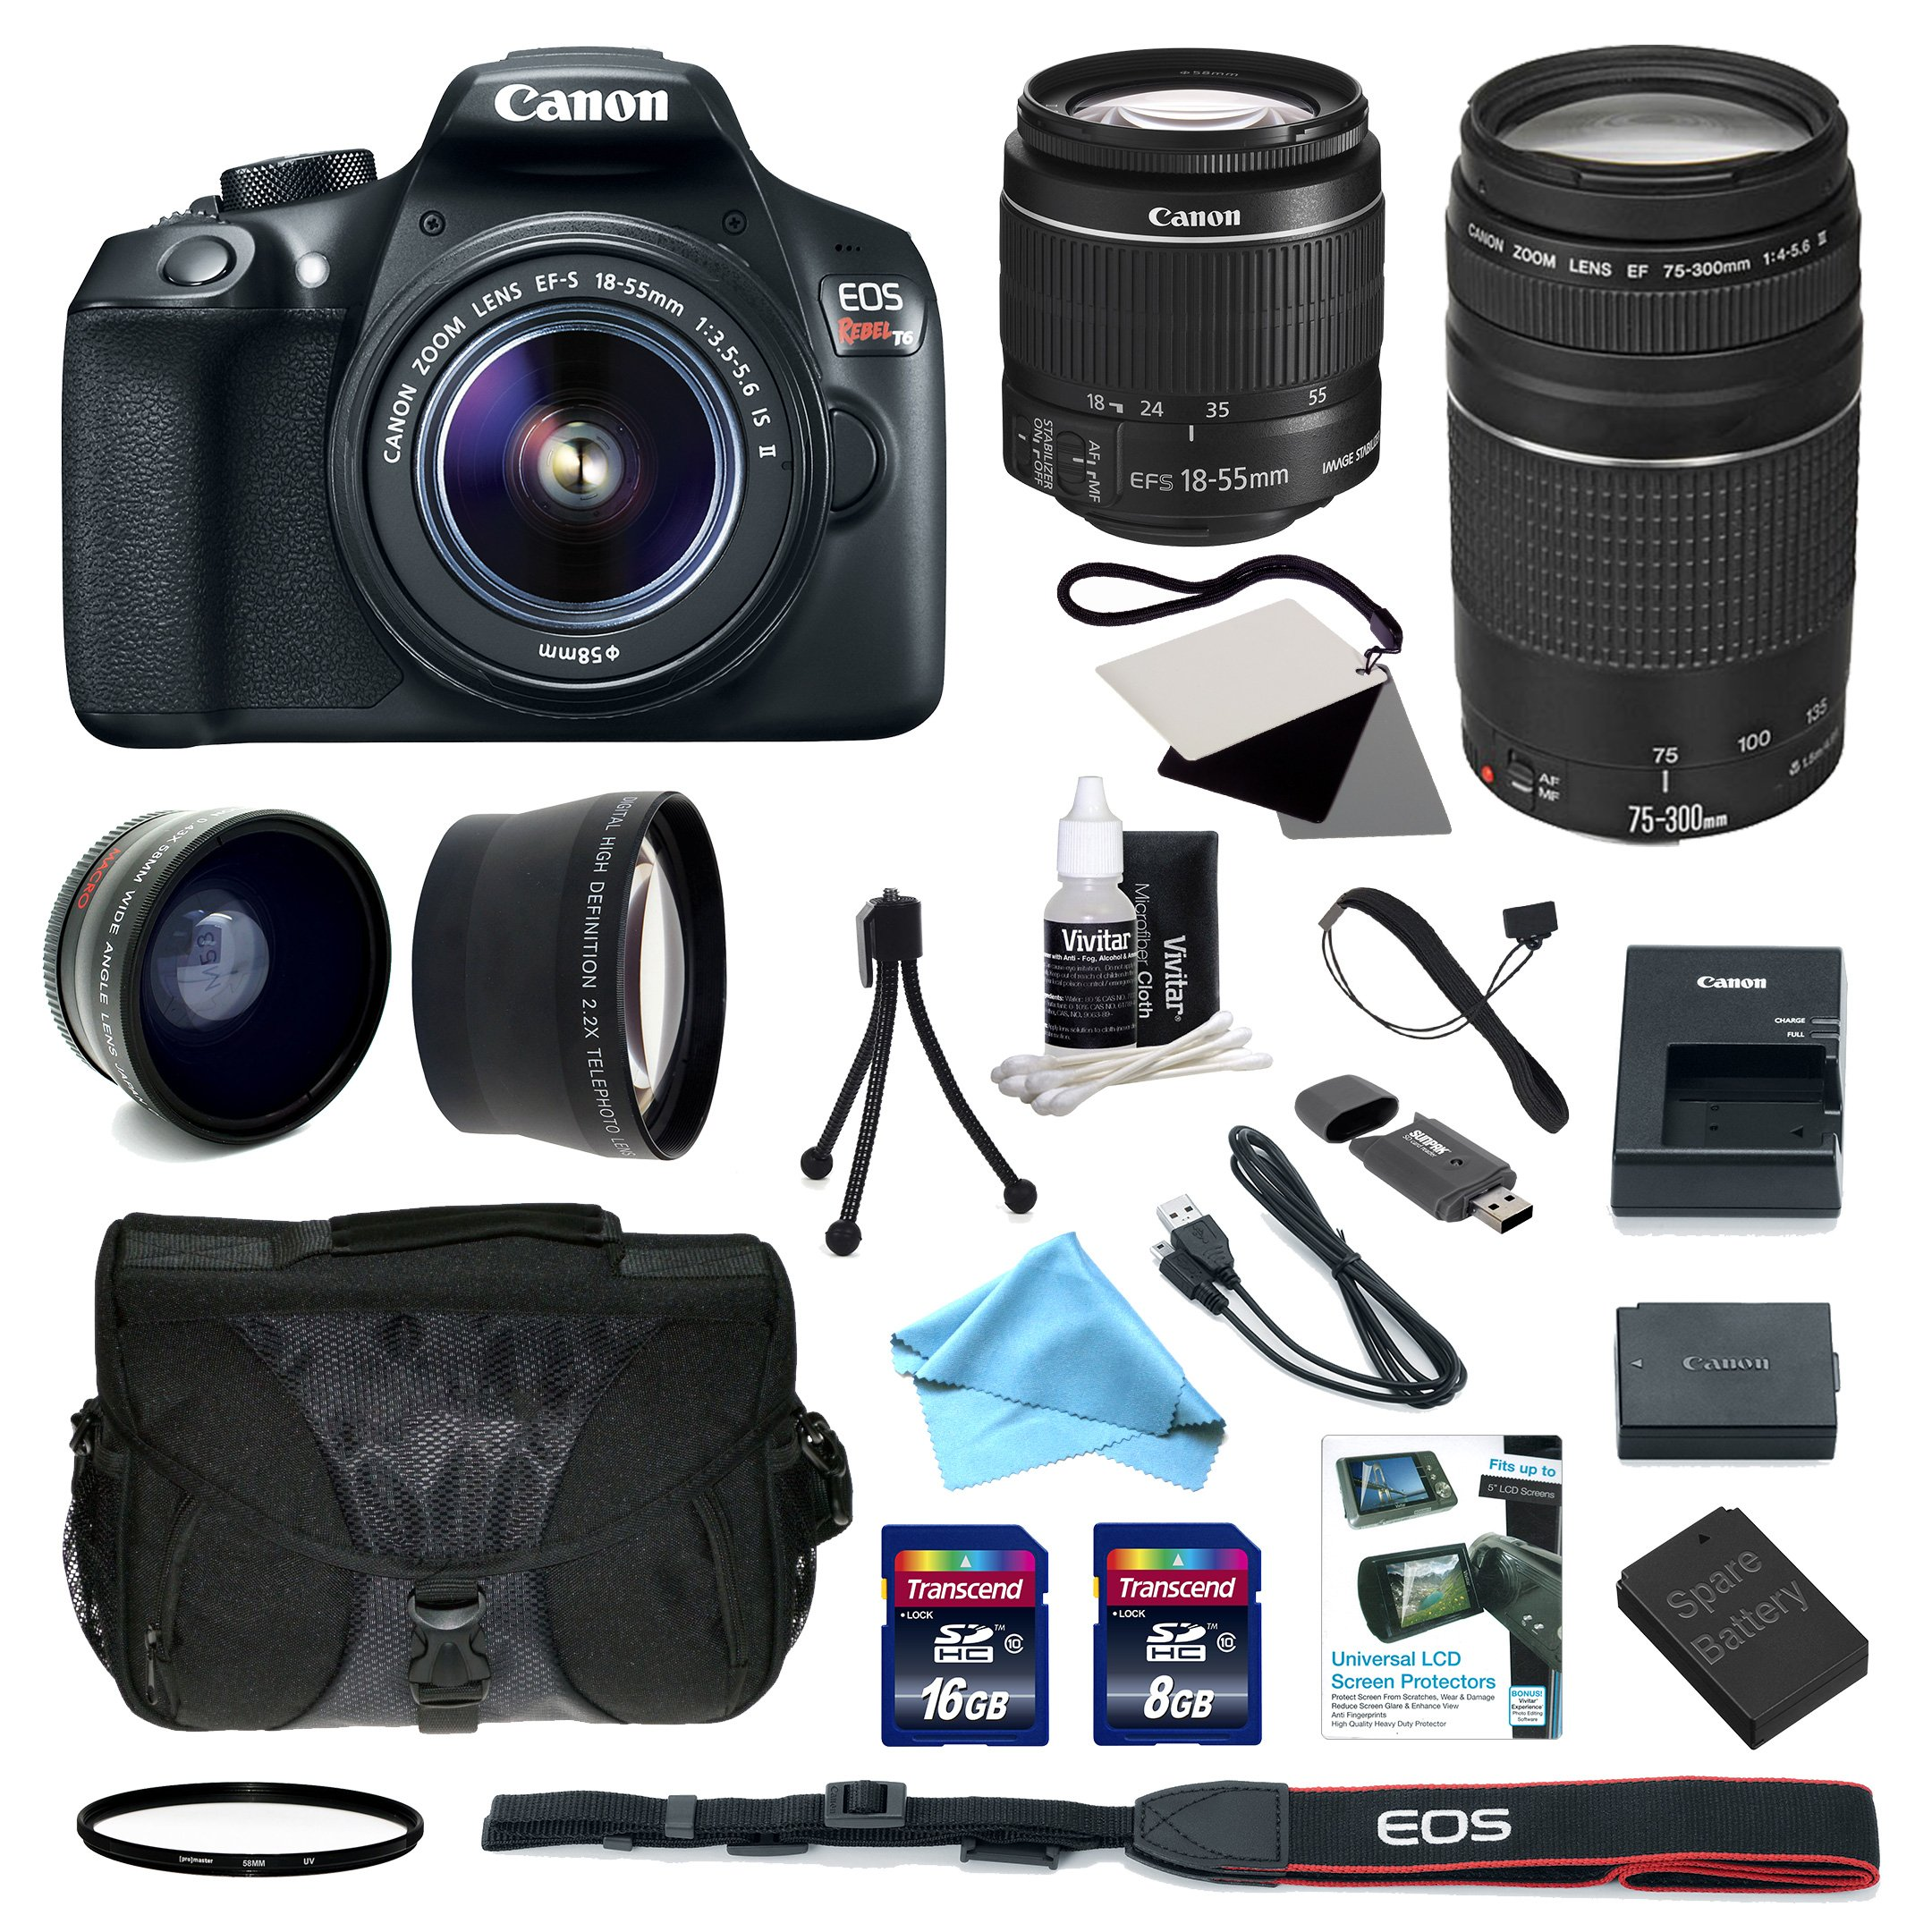 Canon EOS Rebel T6 Digital SLR with EF-S 18-55mm f/3.5-5.6 IS II Standard Zoom Lens + EF 75-300mm f/4-5.6 III Telephoto Zoom Lens + Deluxe Accessory Bundle (99924)